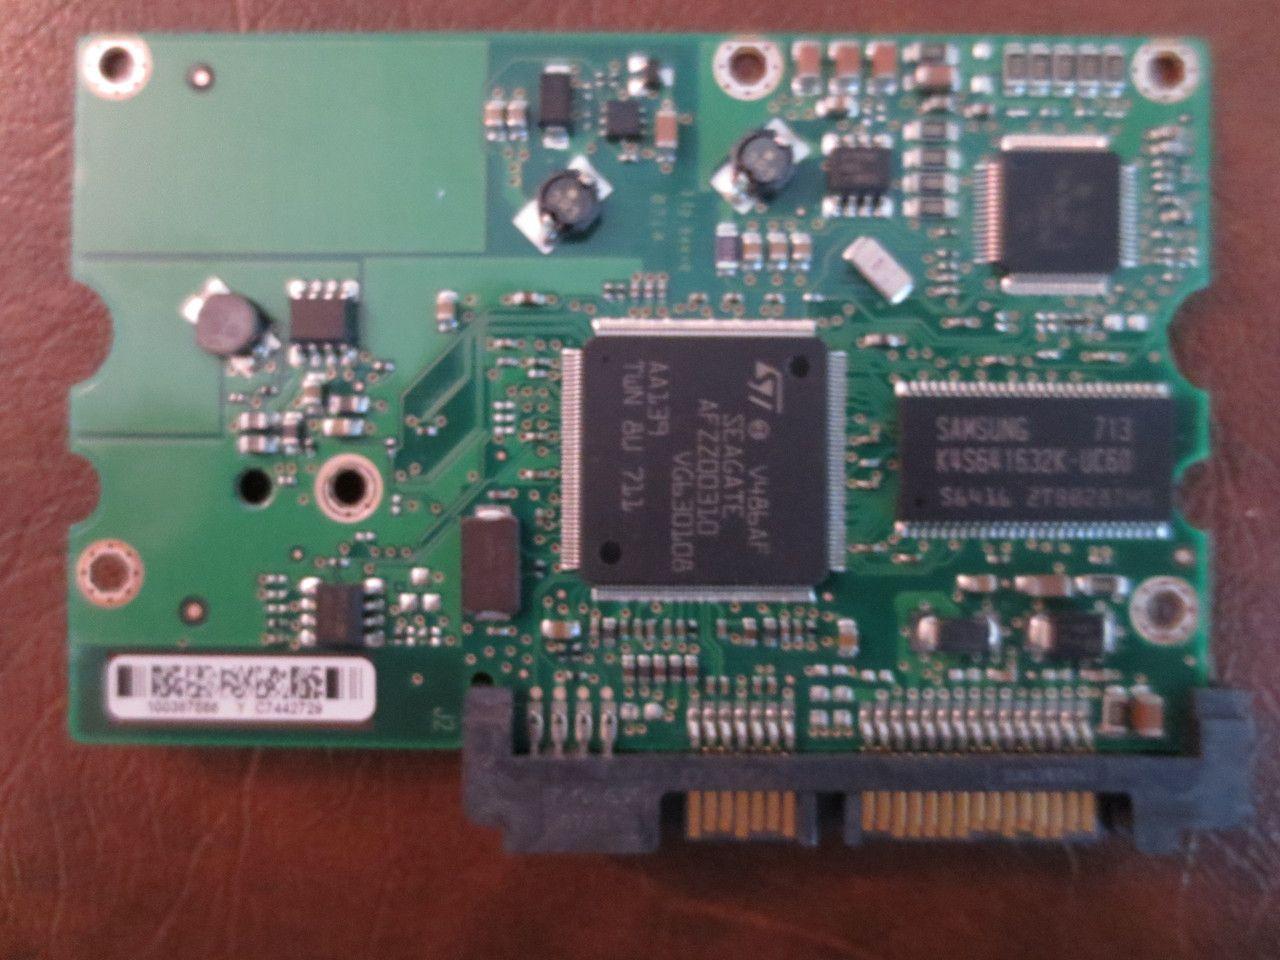 Seagate St3250824as 9bd133 042 Fw3bqk Tk 10038 Hard Circuit Board Repair Printed Bqk 100387566 Y 250gb Sata Pcb Effective Electronics Data Recovery Drive Computer Drives Parts